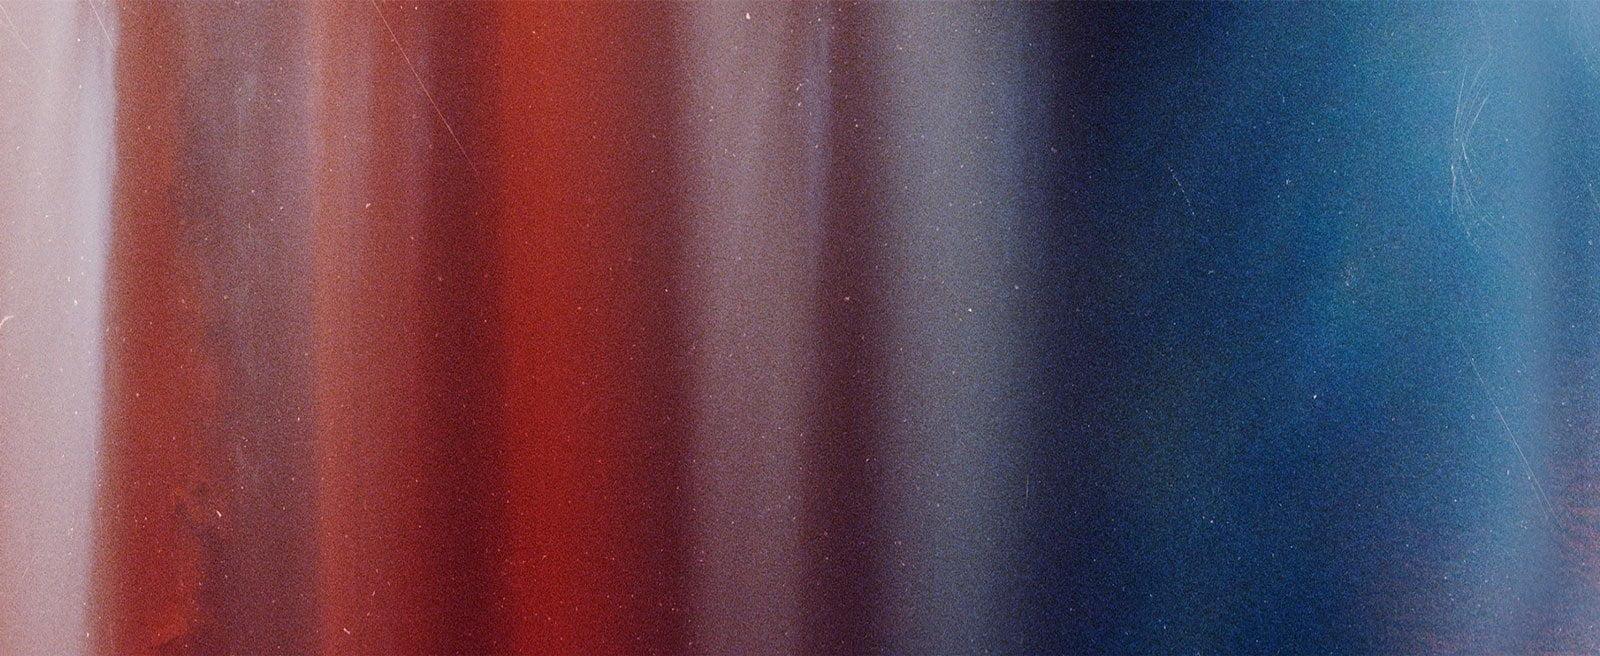 designplus abstraktes Hintergrundbild Köln